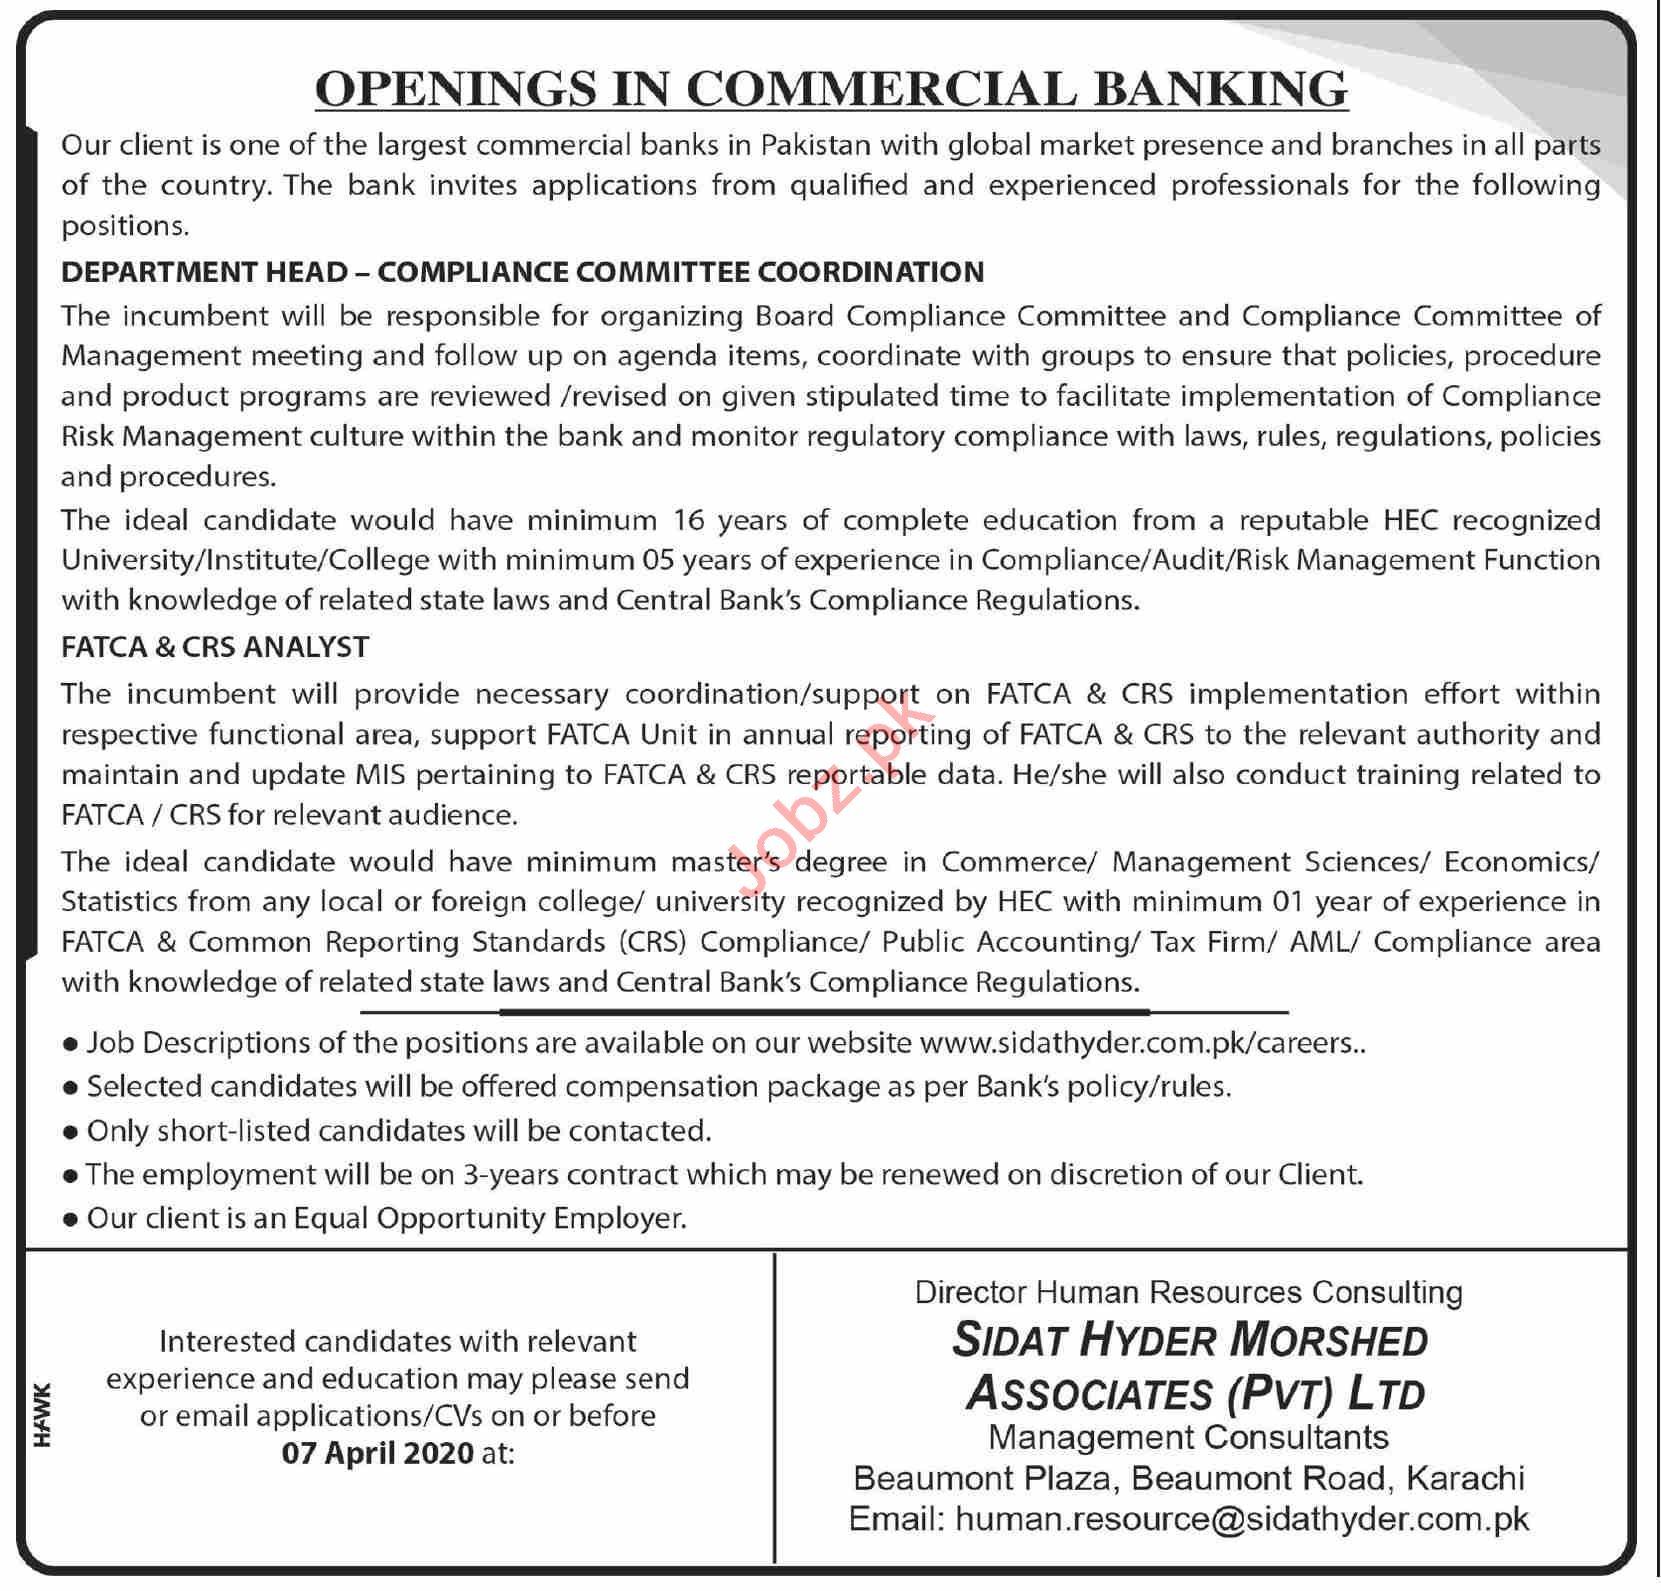 Department Head Jobs in Sidat Hyder Morshed Associates